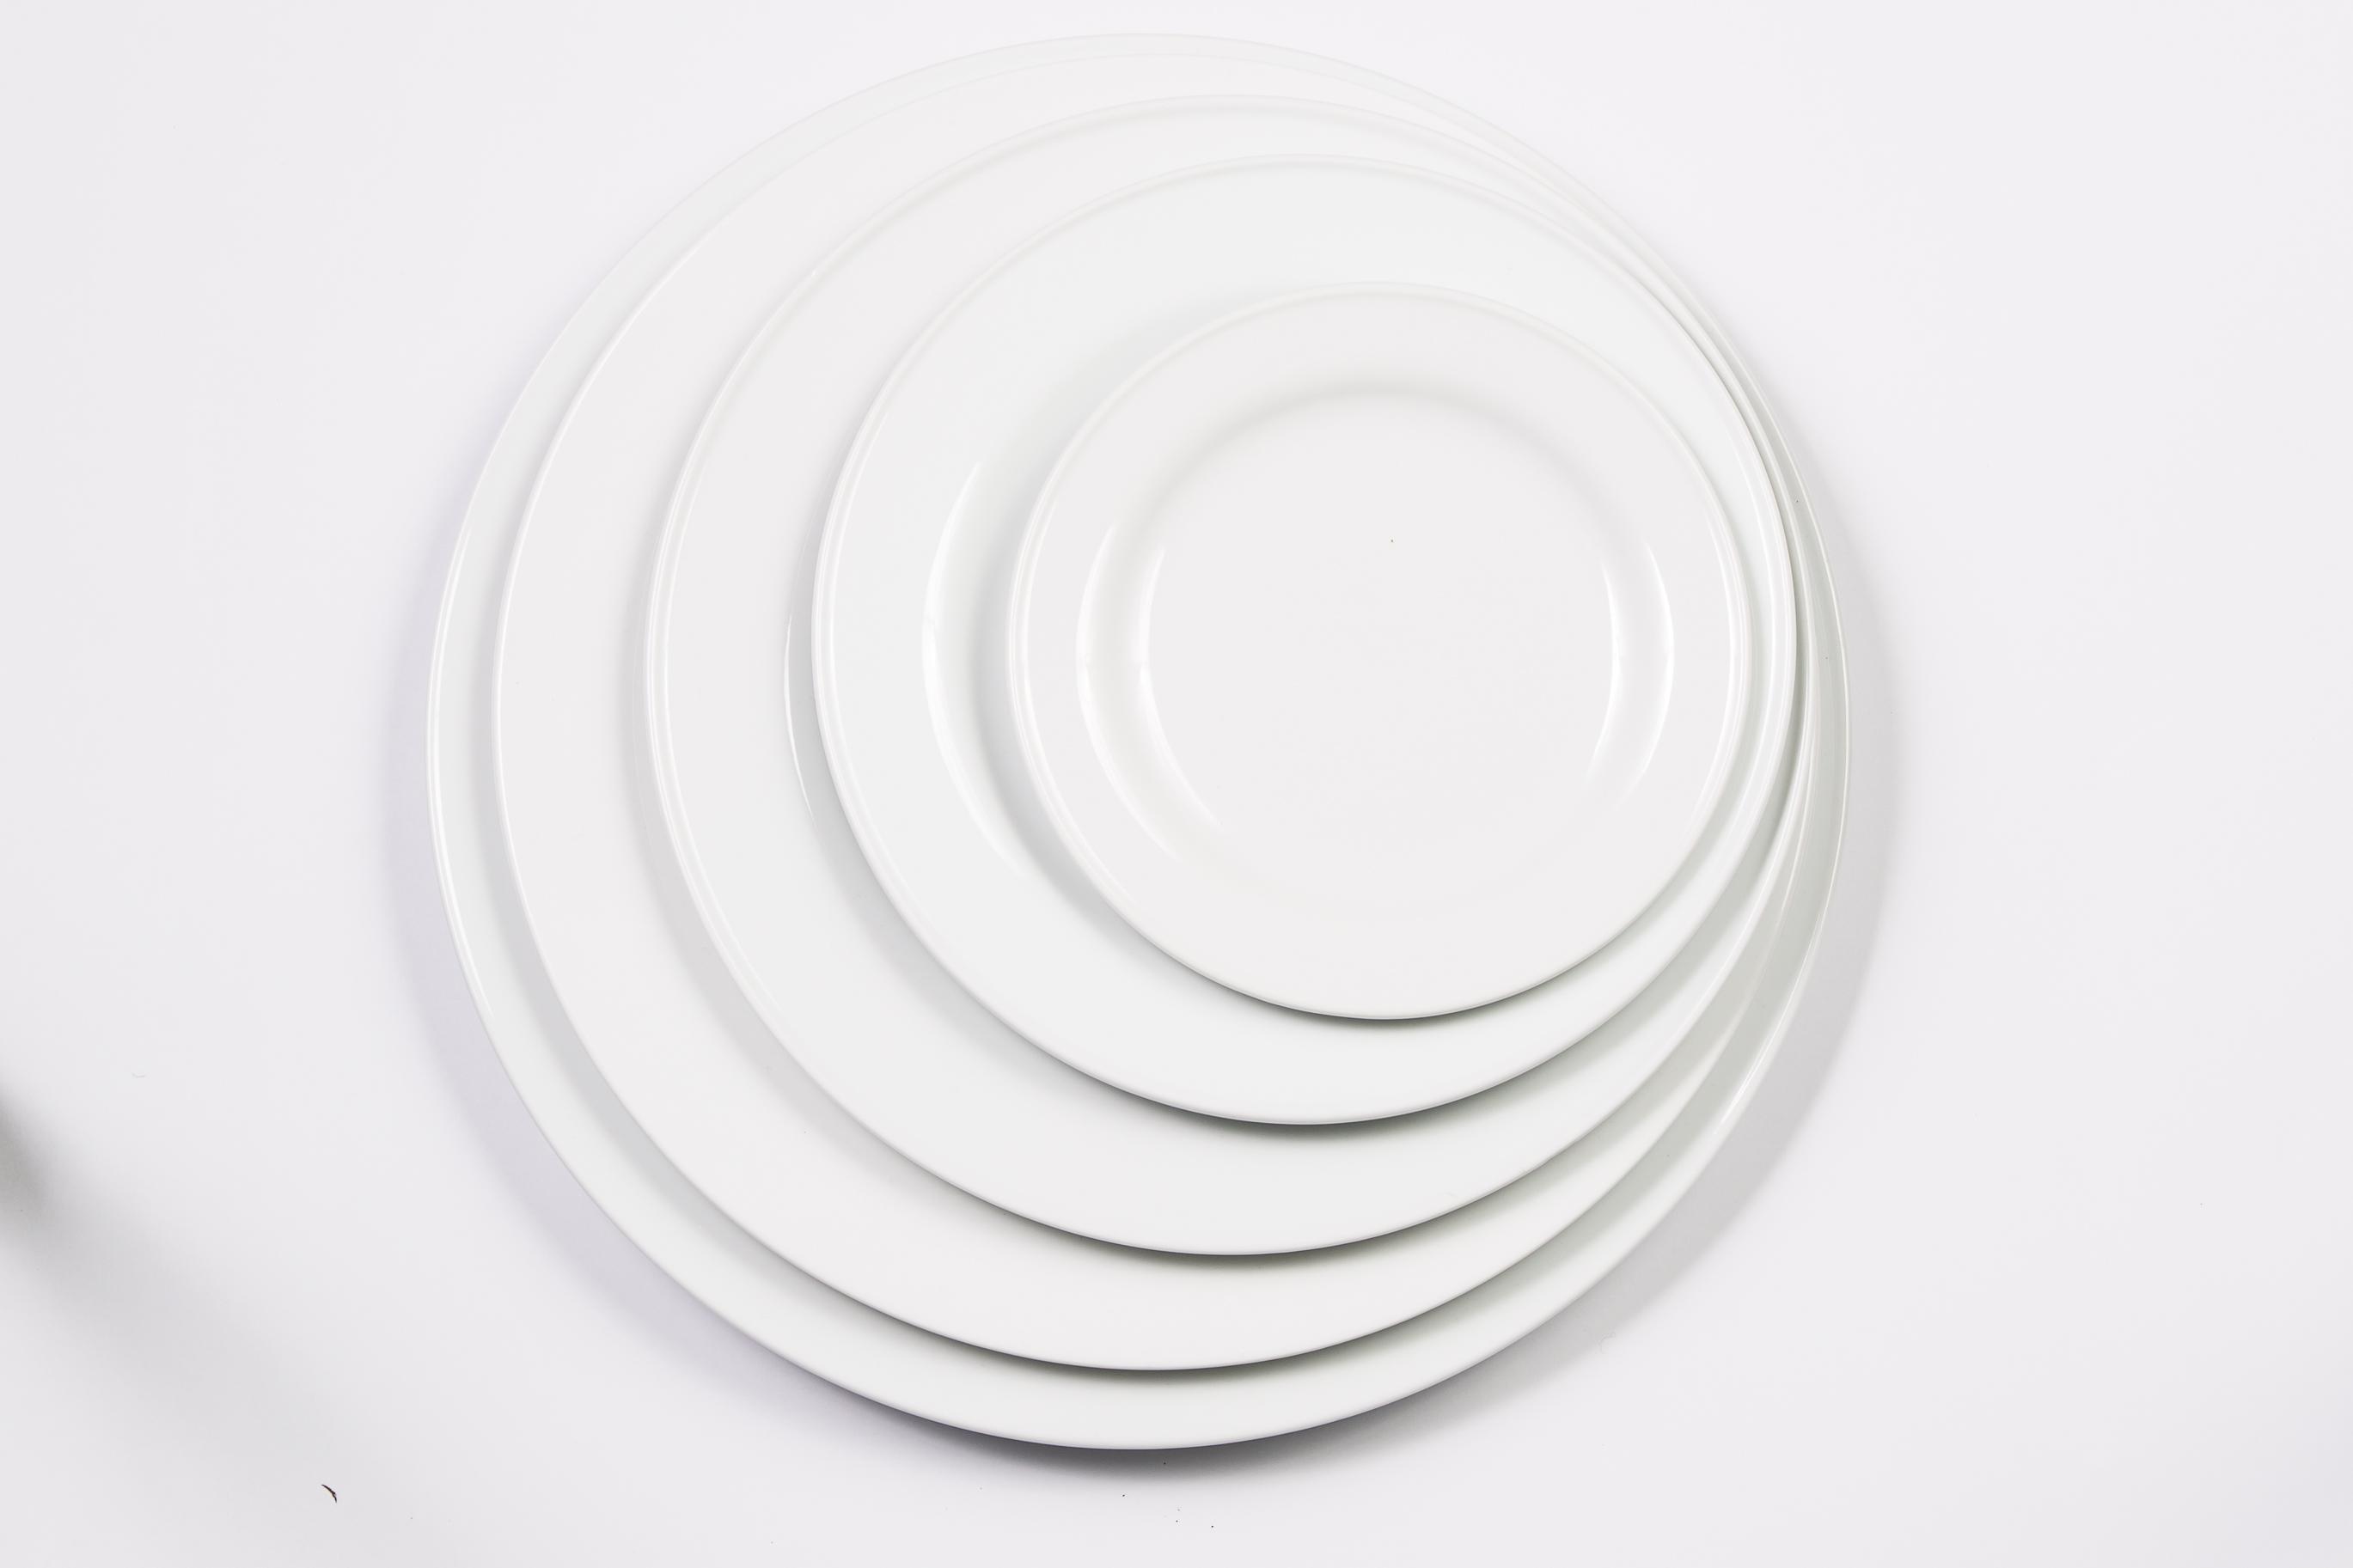 Plato pan crockery 15 cm porcelana blanca crockery rental - Platos porcelana blanca ...